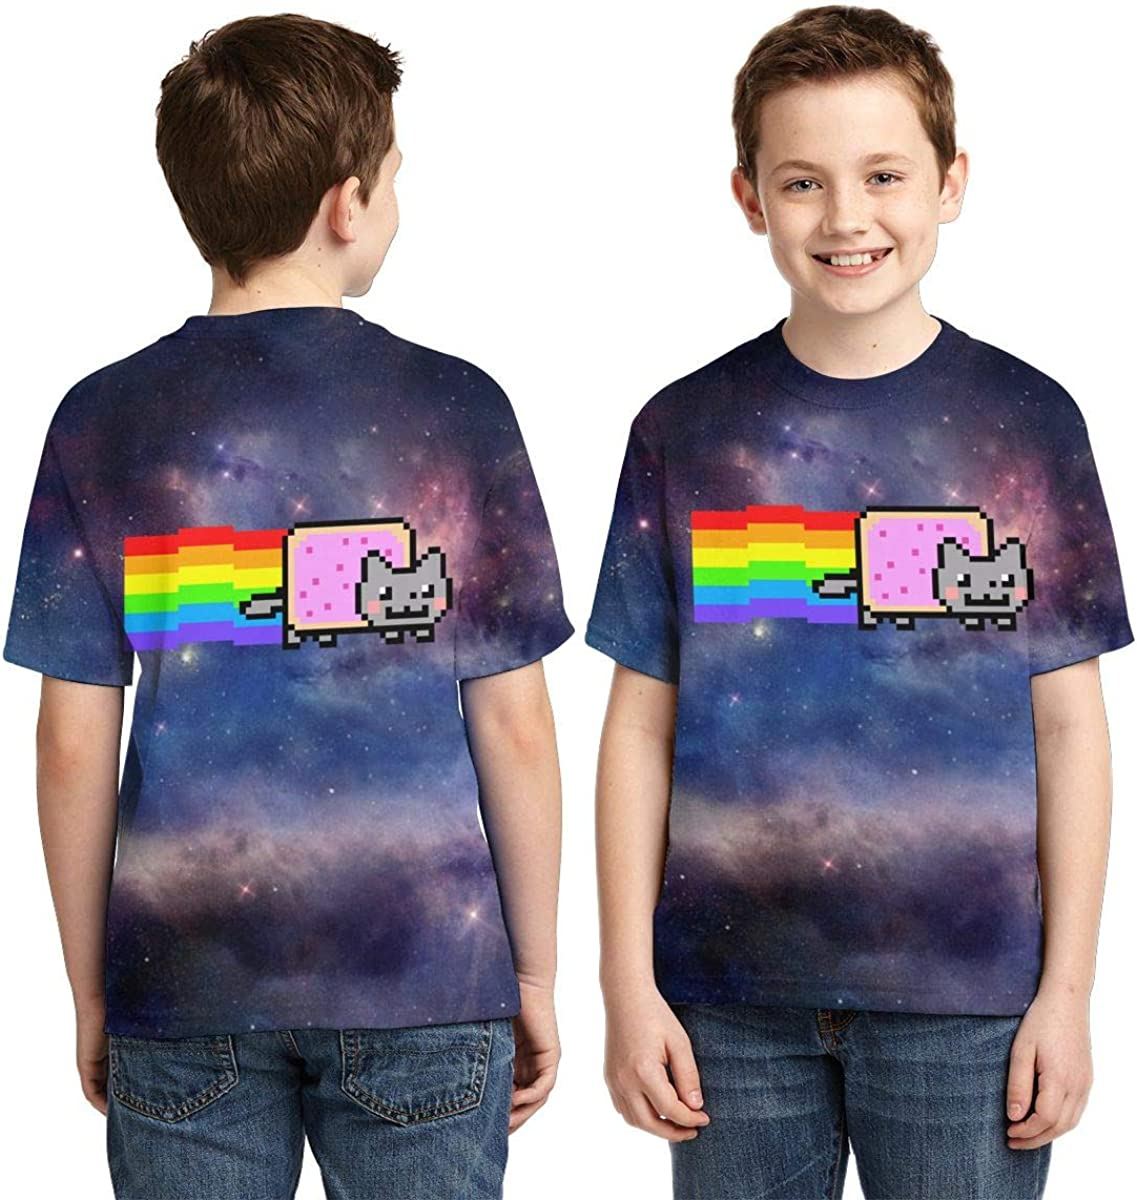 Traci StoneN Kid//Youth Nyan Cat T-Shirts 3D Print Short Sleeve Graphics Tees for Boys